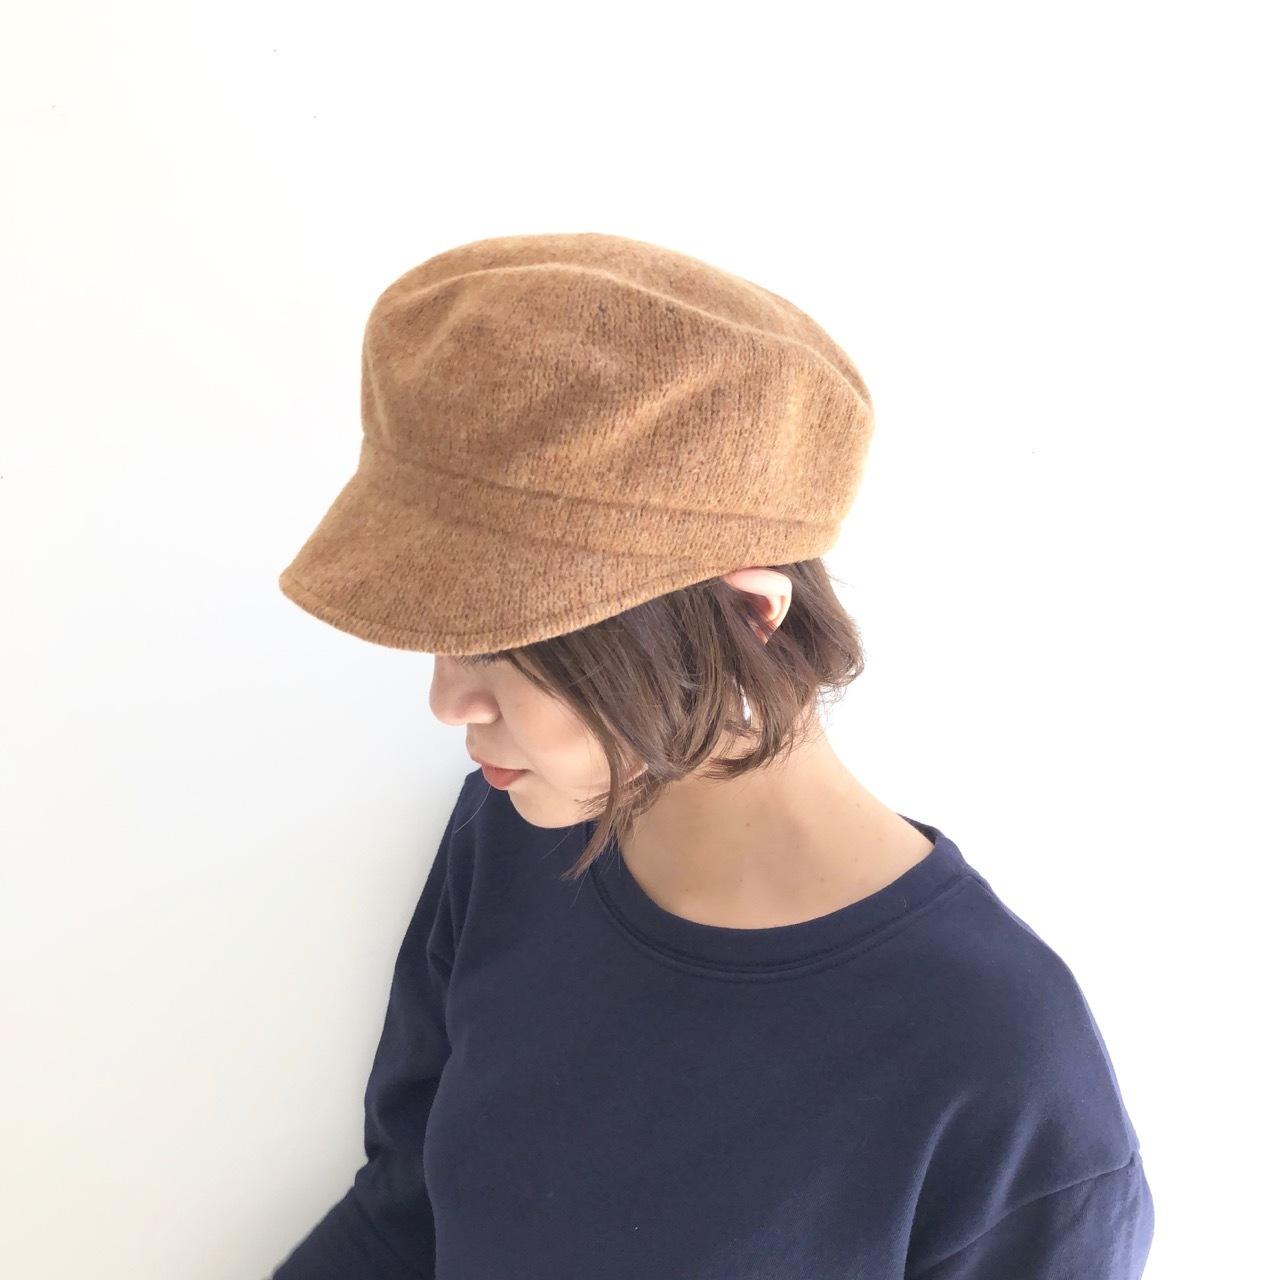 【 Days 】- 119-5757-ニットキャスケット